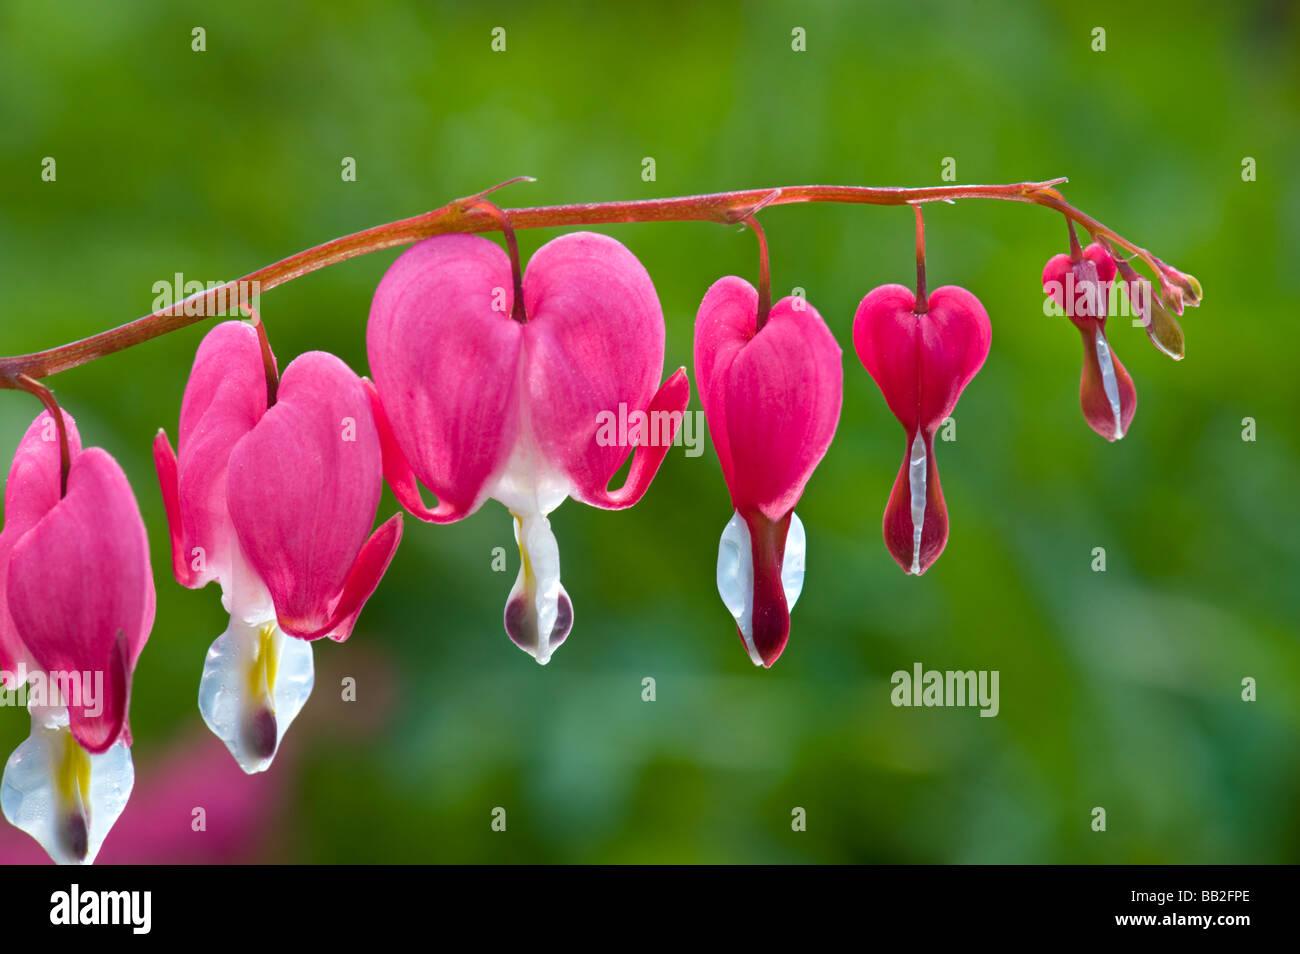 fumariaceae Dicentra spectabilis bleeding heart  branch garden green red pink heart love lovely flower blossom flowering - Stock Image